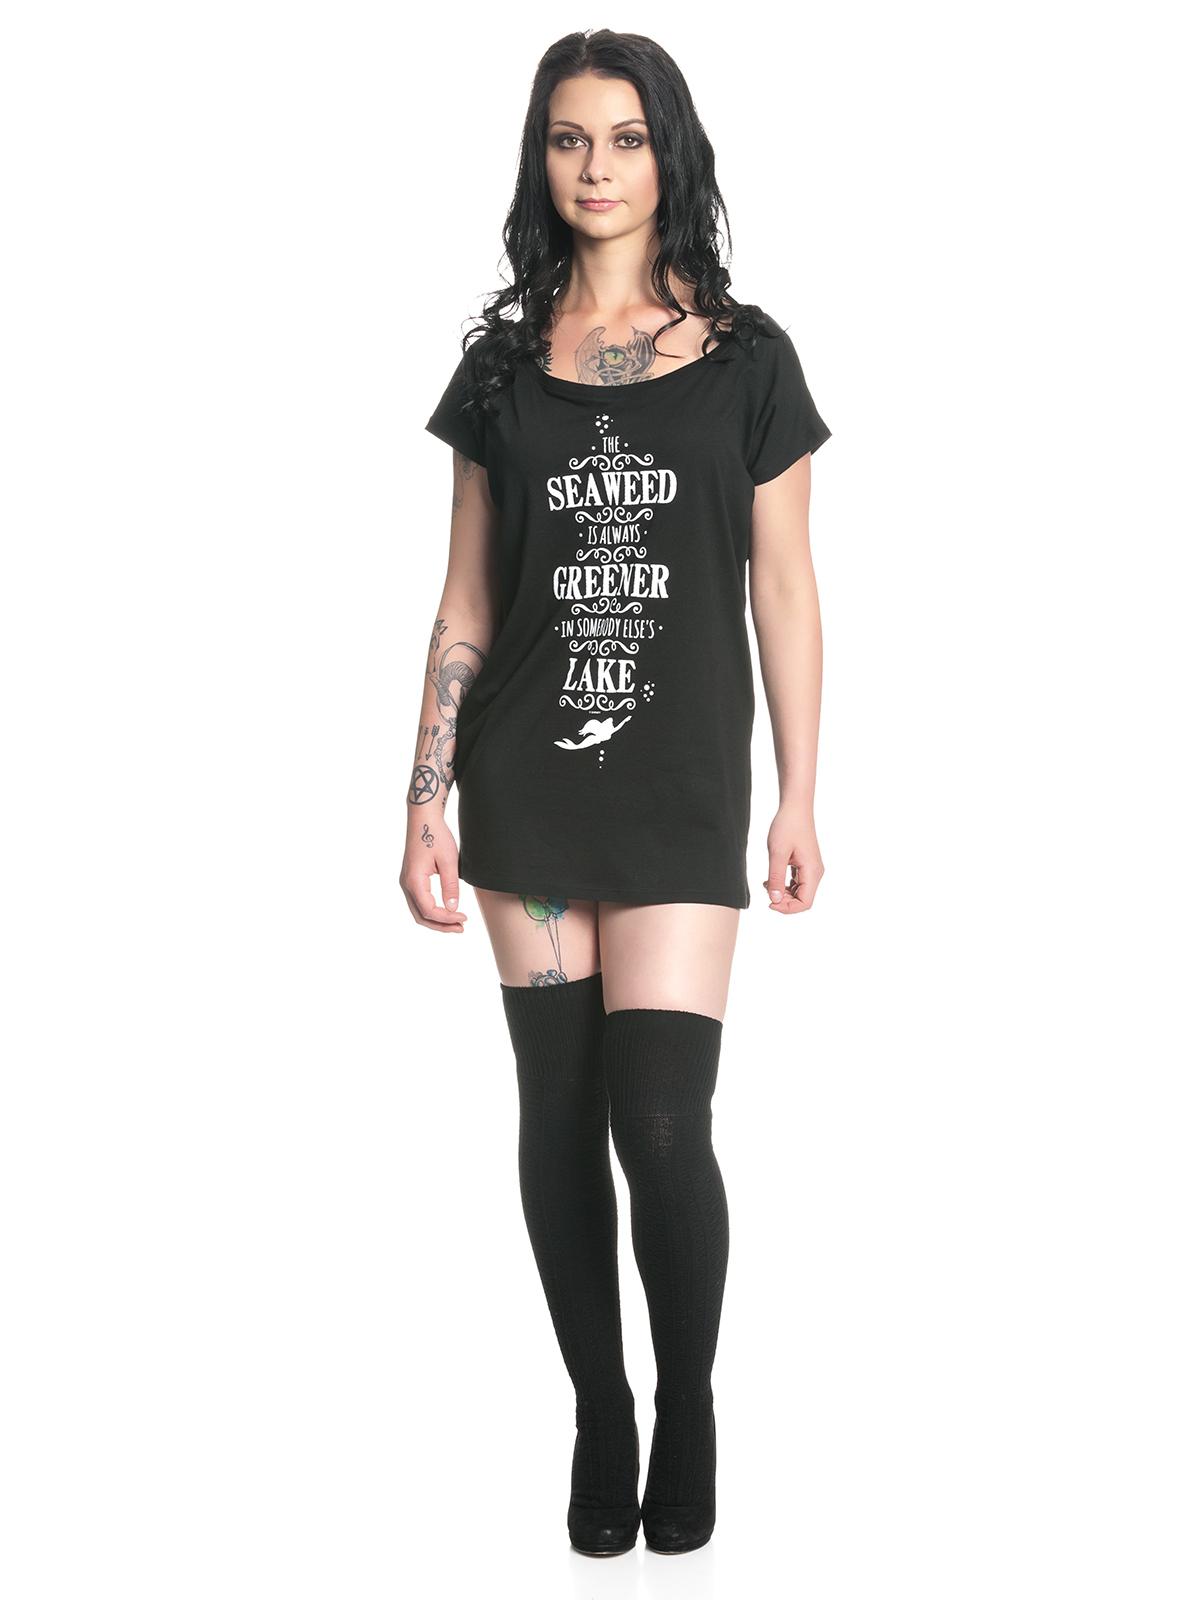 arielle seaweed damen t shirt schwarz damen t shirts tops. Black Bedroom Furniture Sets. Home Design Ideas